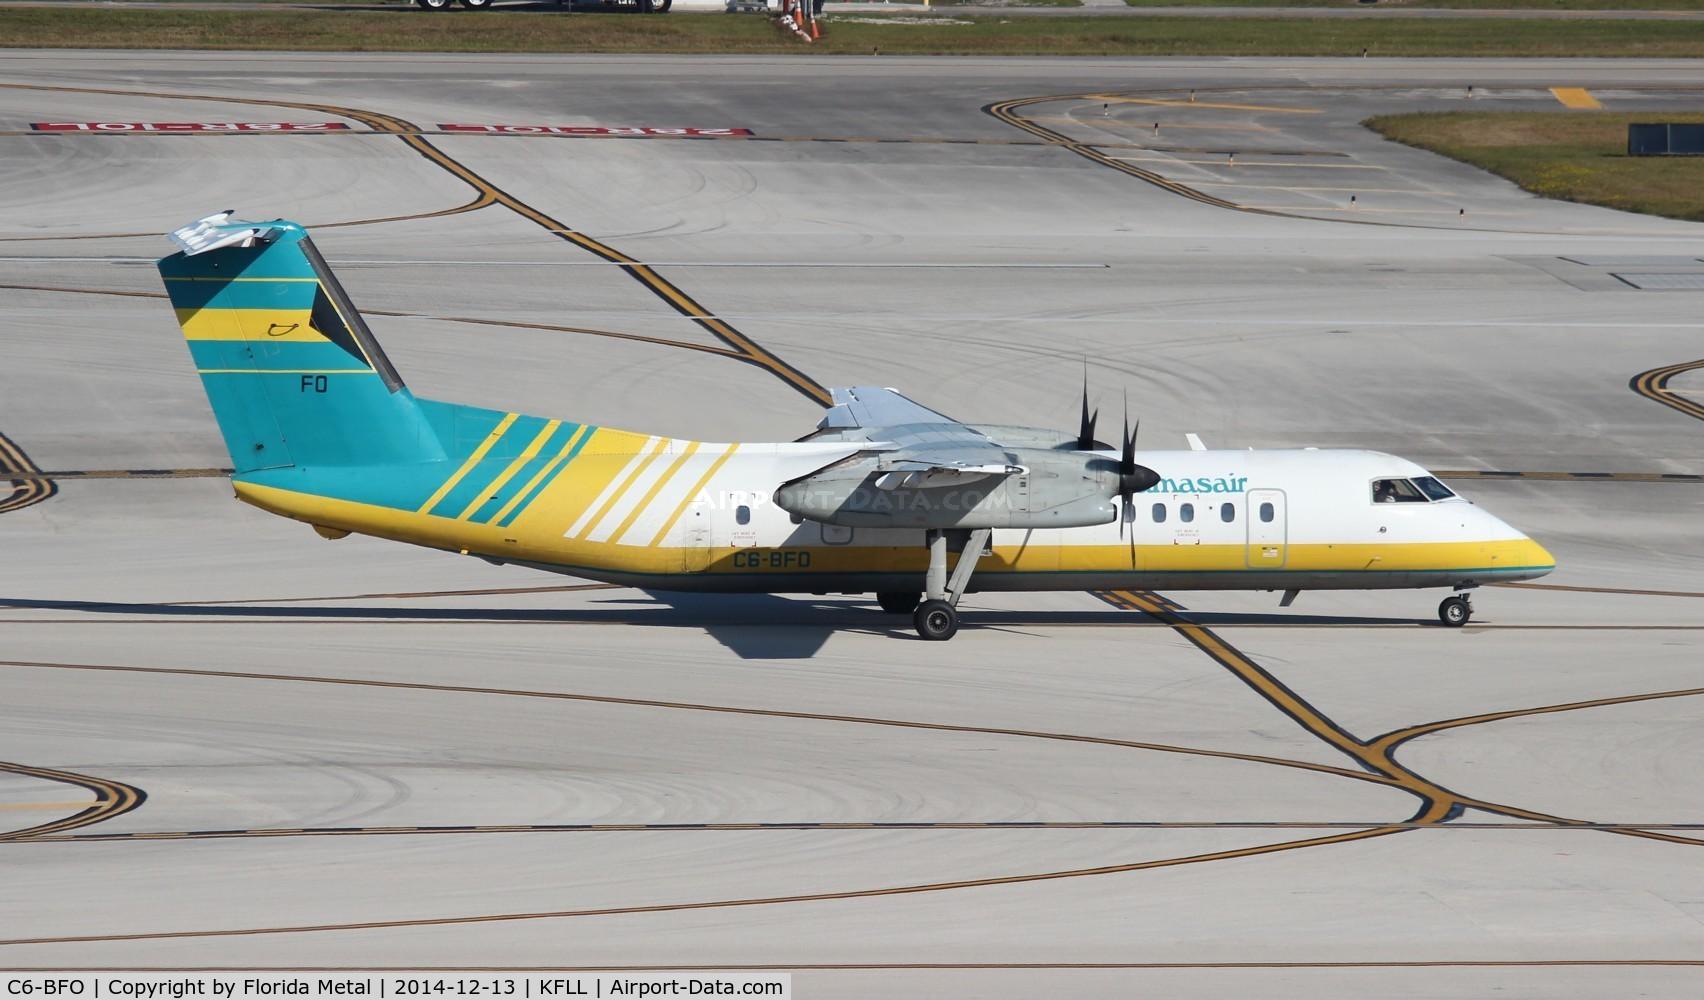 C6-BFO, 1989 De Havilland Canada DHC-8-301 Dash 8 C/N 164, FLL spotting